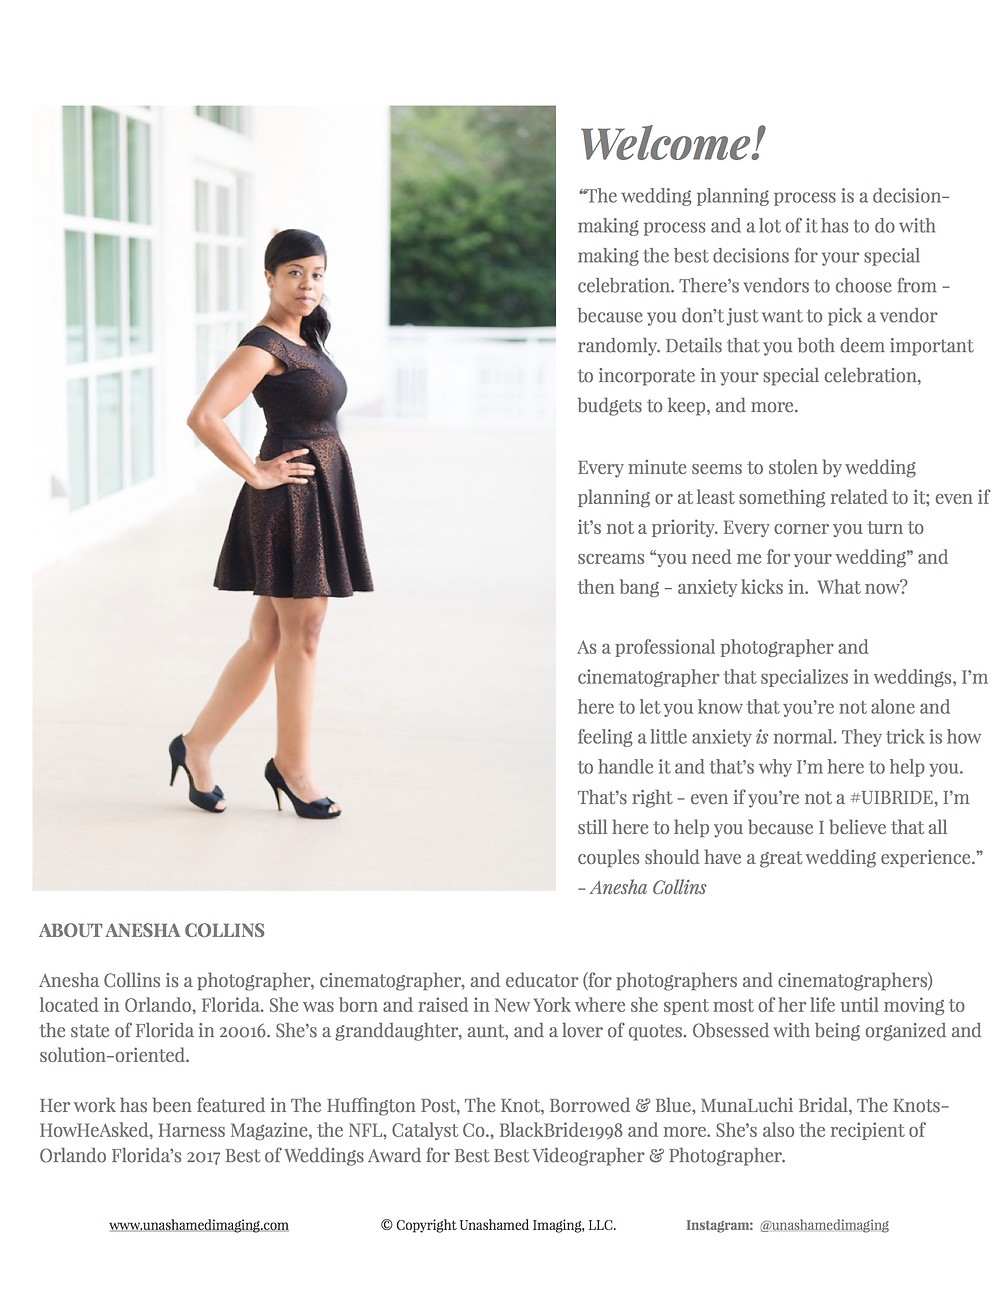 Orlando Wedding Photographer, Wedding Planning Checklist